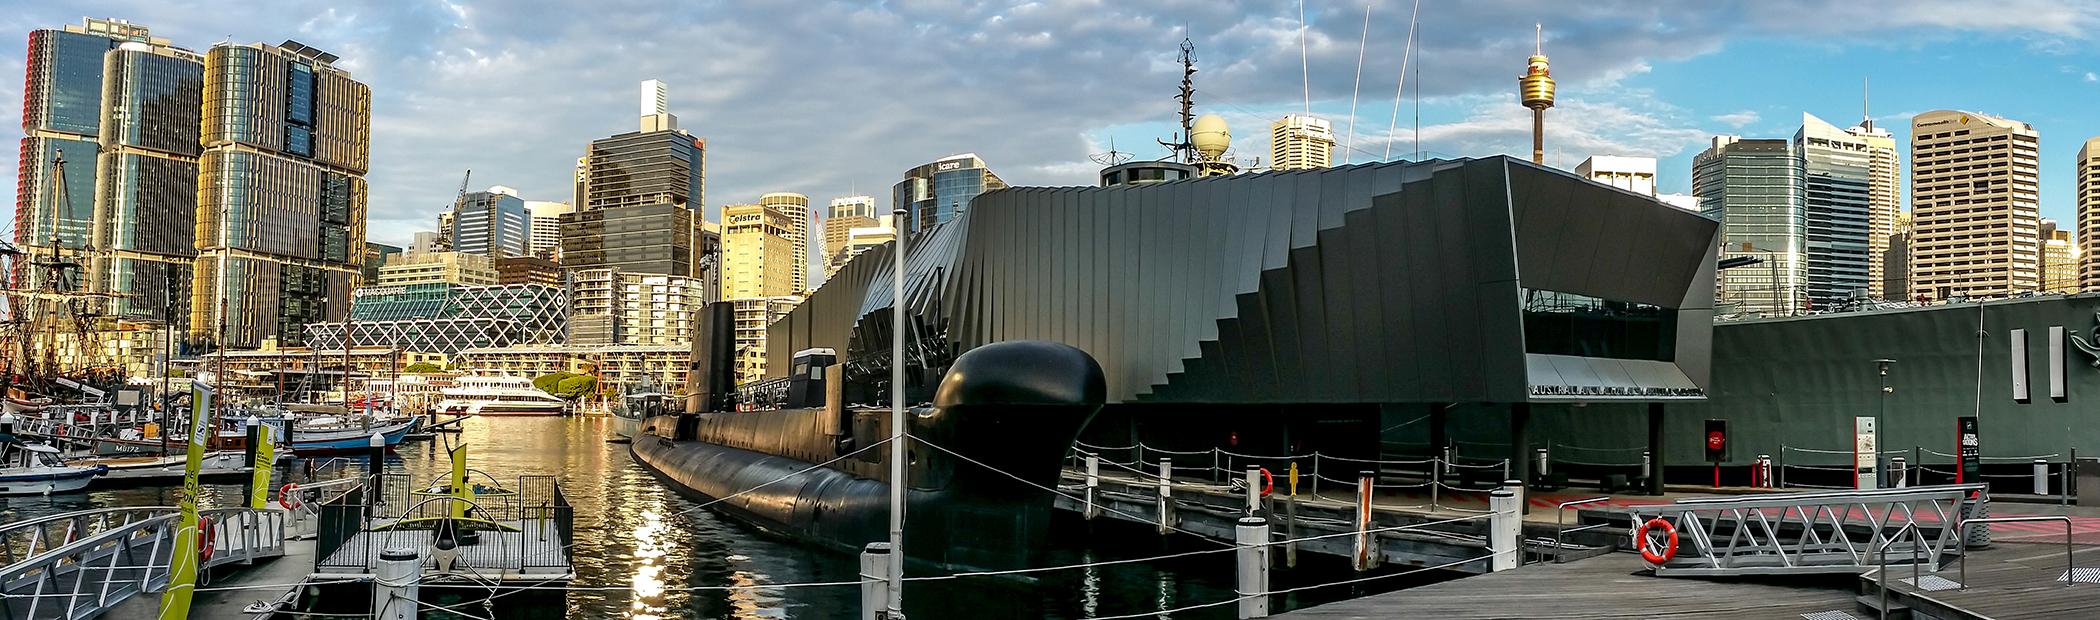 Australian Maritime Museum, Sydney Harbour NSW